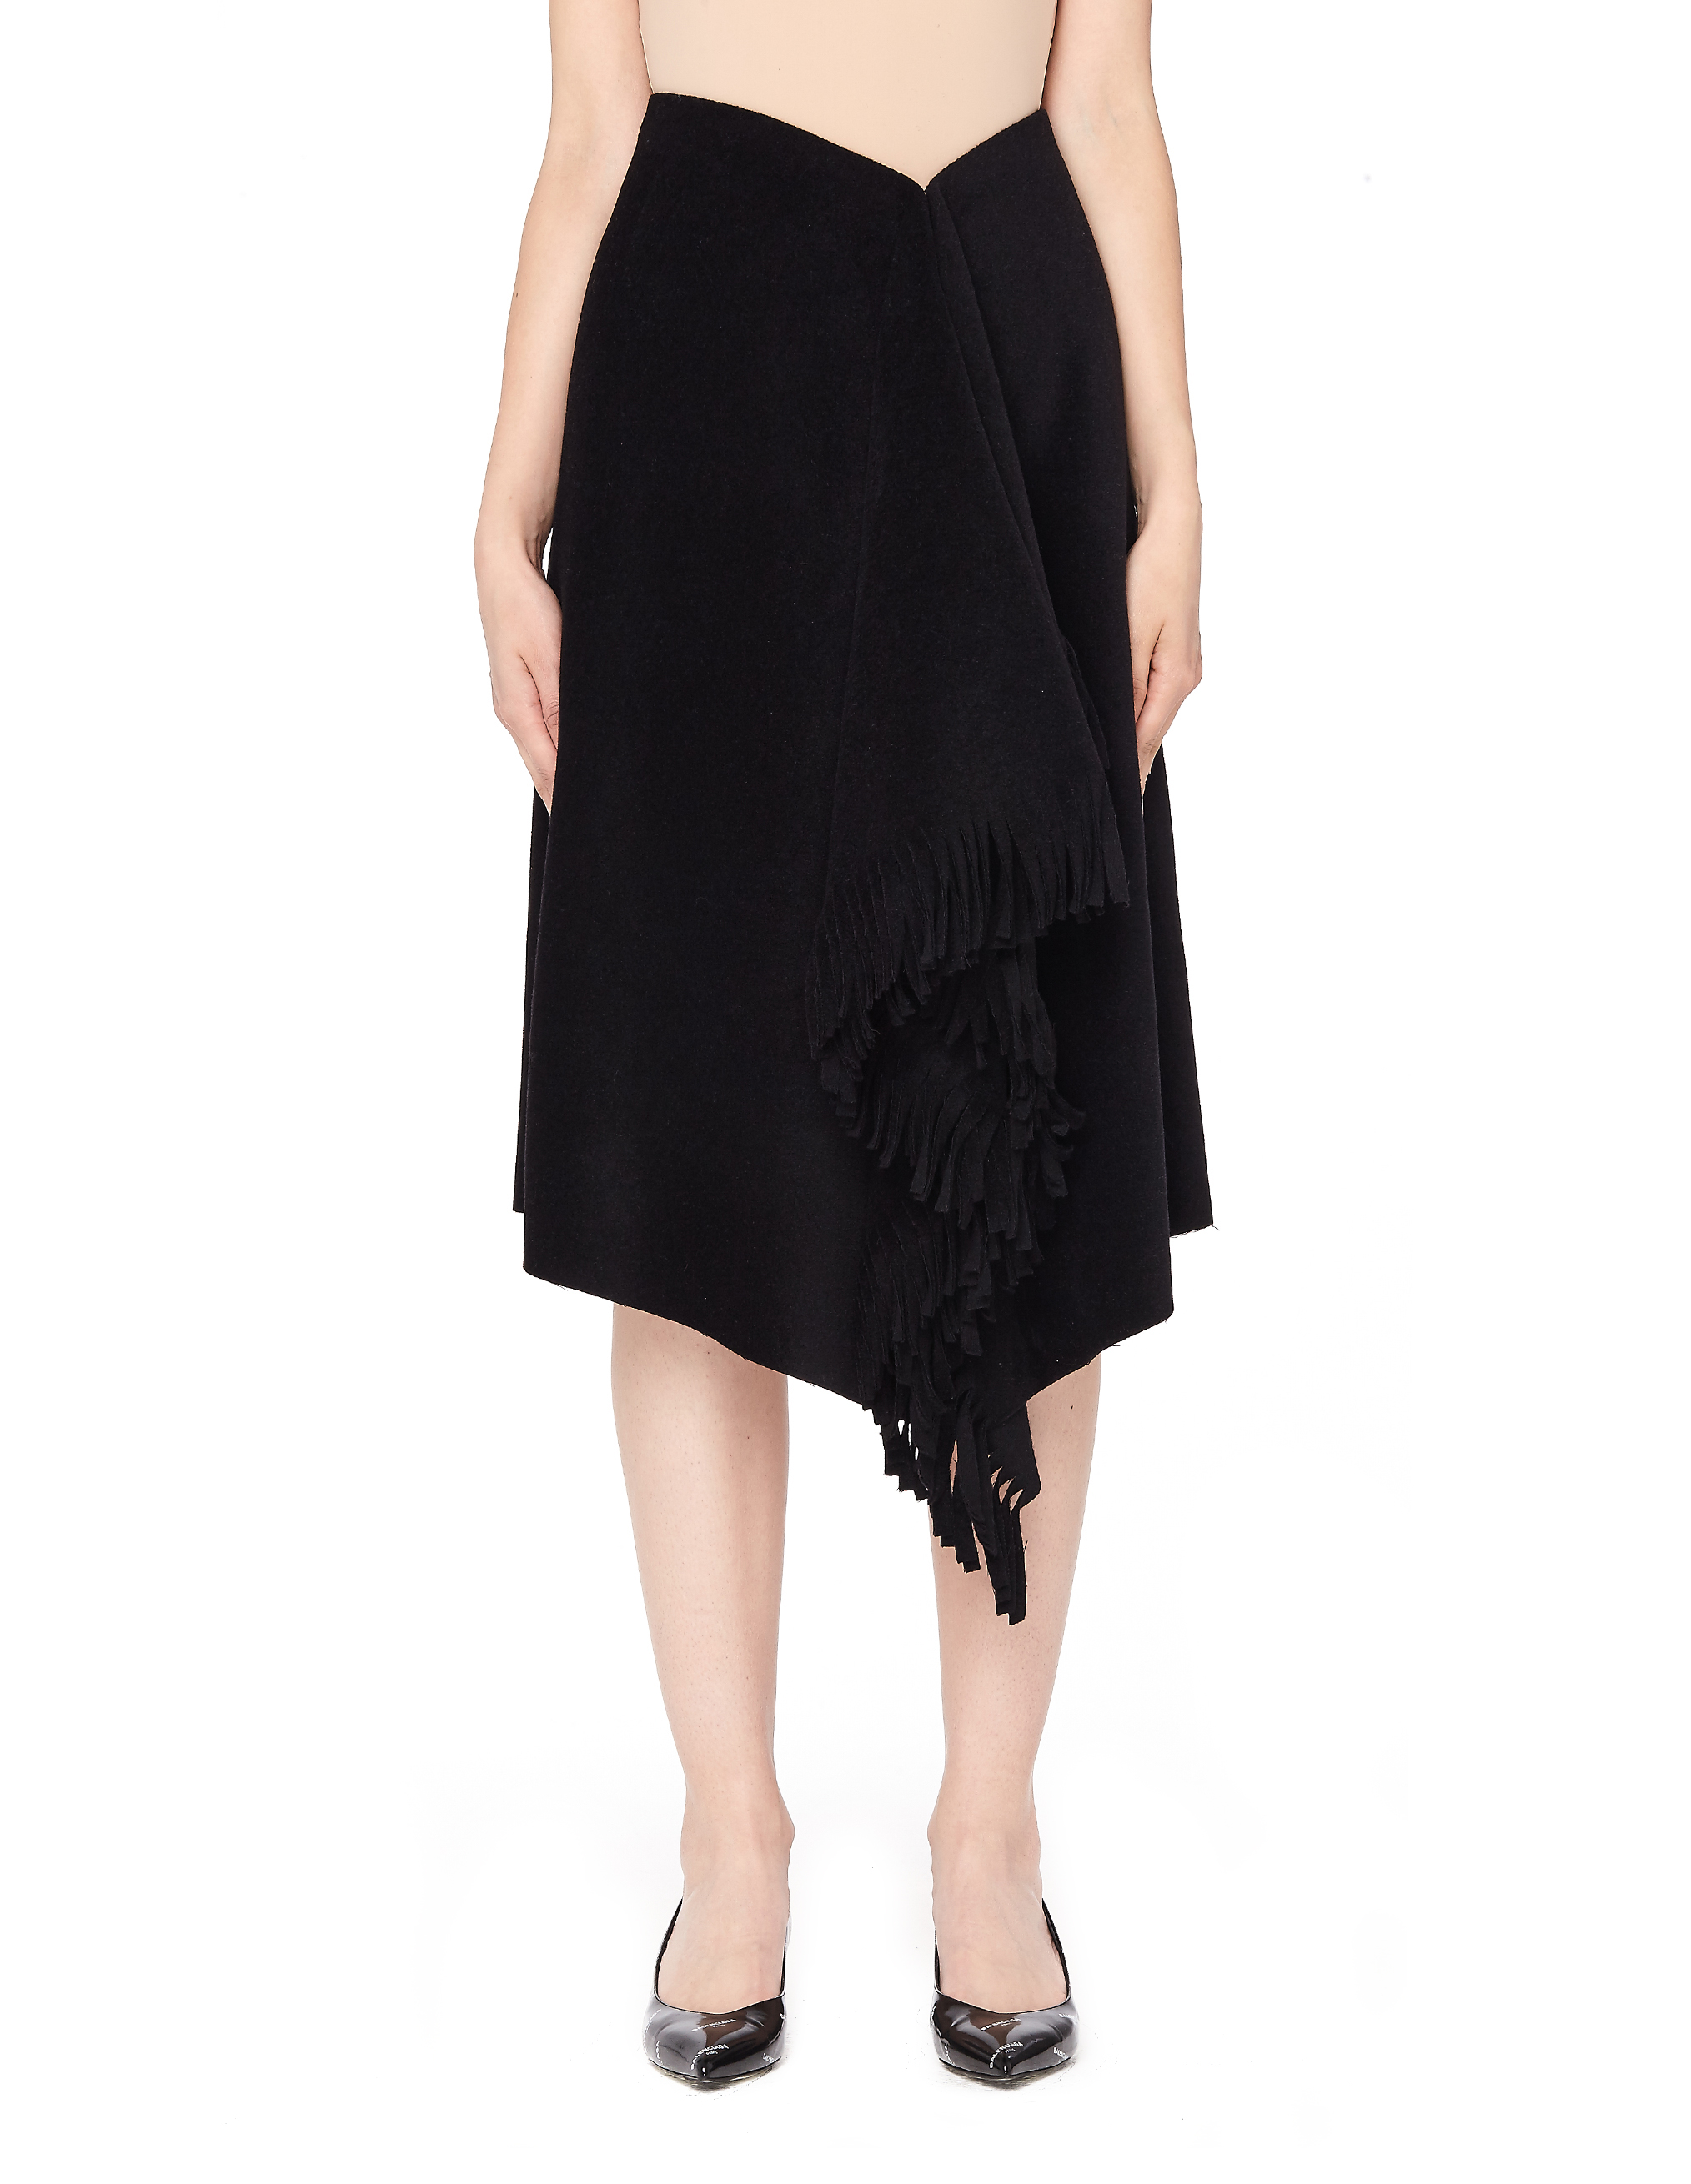 Balenciaga Black Fringe Skirt